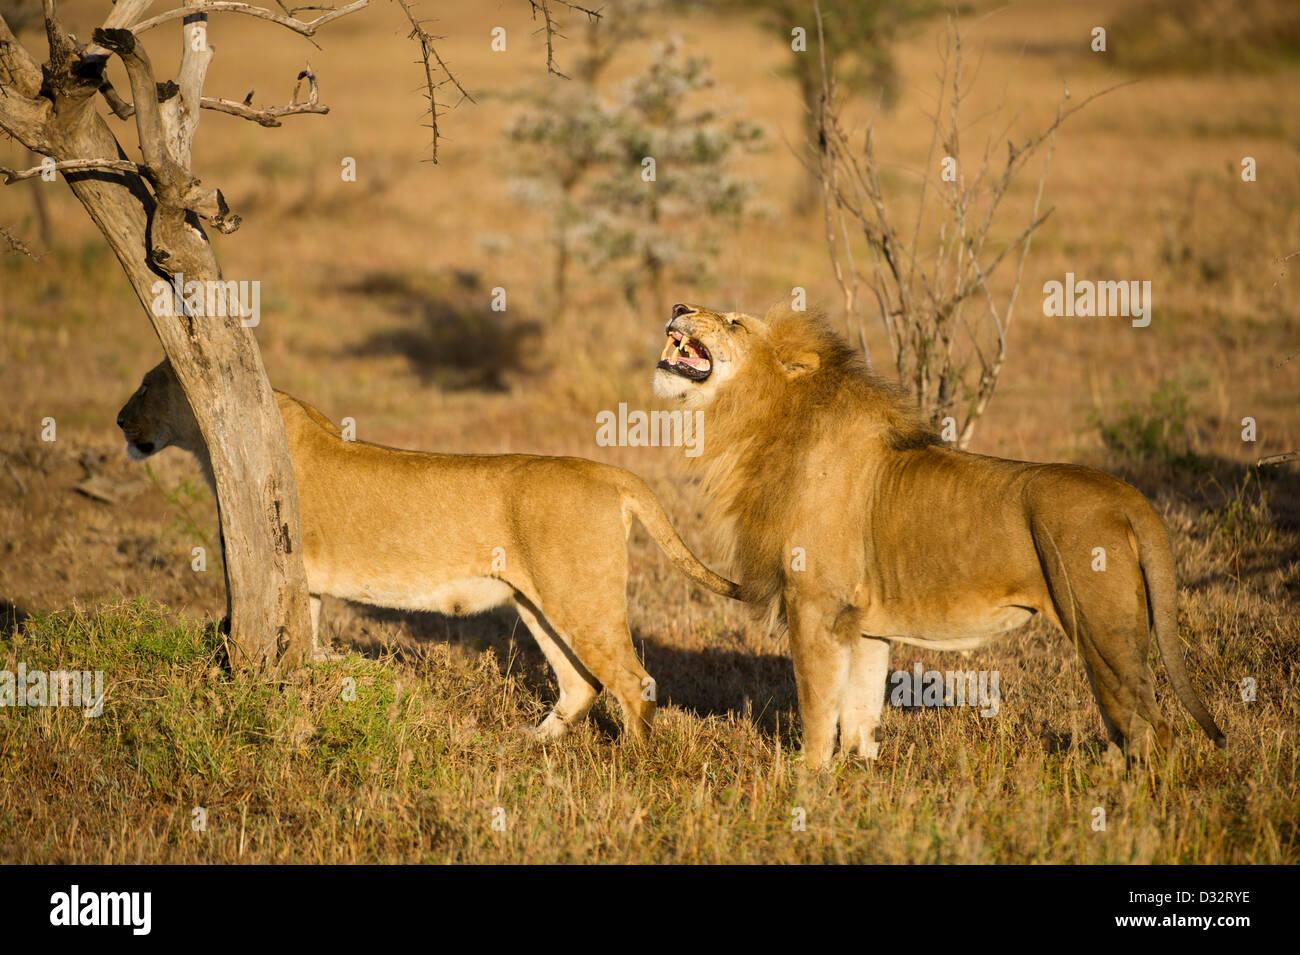 mating pair of lions (Panthero leo), Maasai Mara National Reserve, Kenya - Stock Image